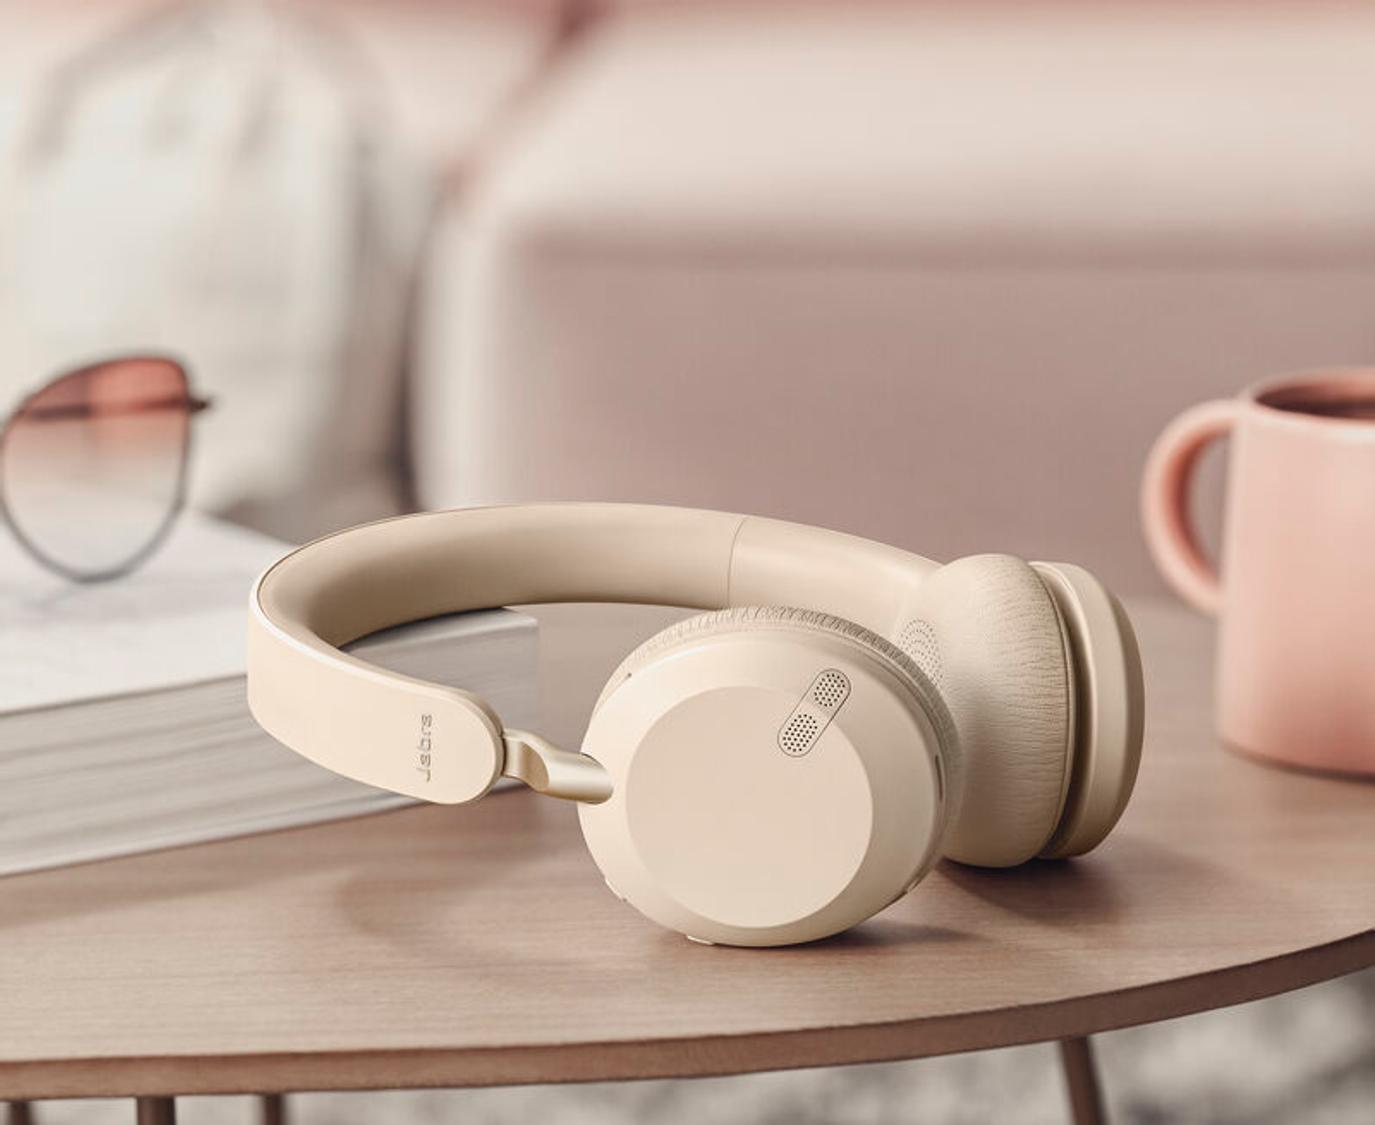 Jabra headphones techbuzzireland